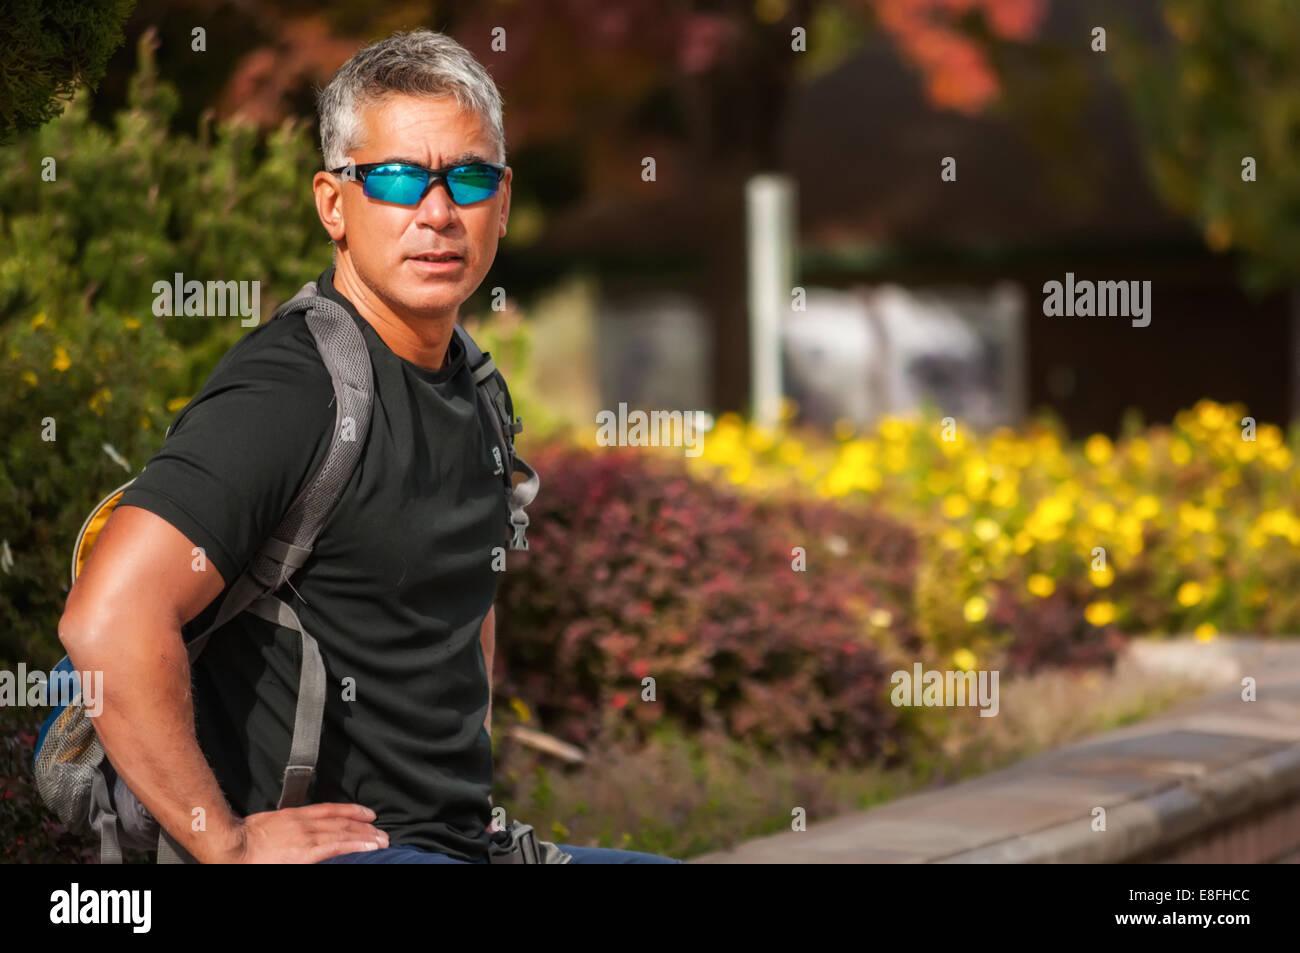 USA, Idaho, Ada County, Boise, Portrait of athletic man wearing sunglasses Stock Photo